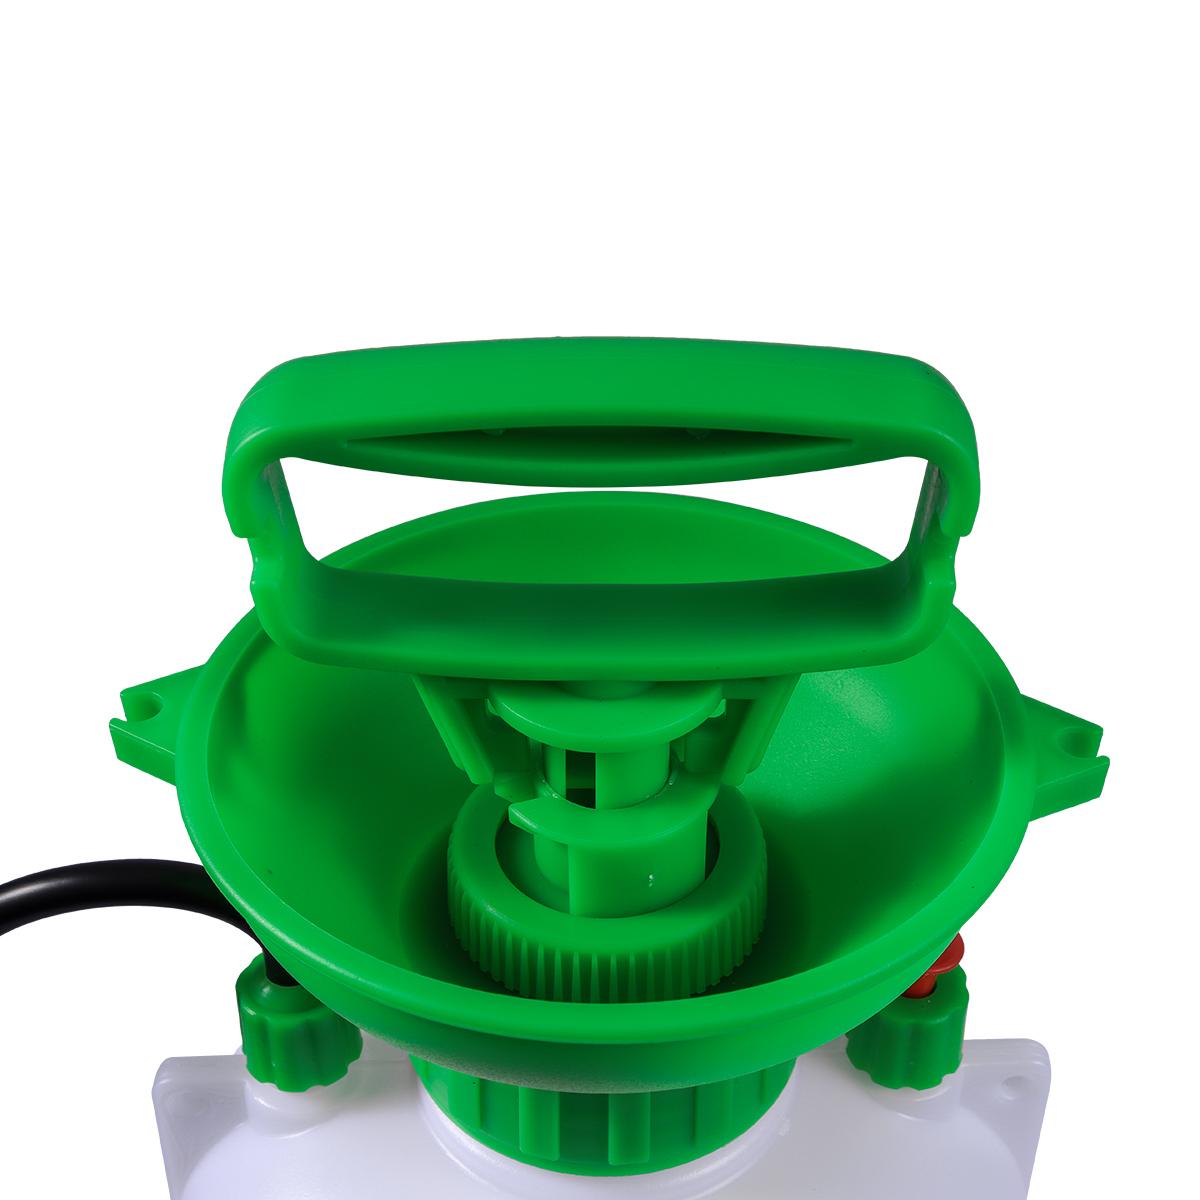 Pulverizador Pressão Acumulada 8 Litros SuperAgri SAPPA8L